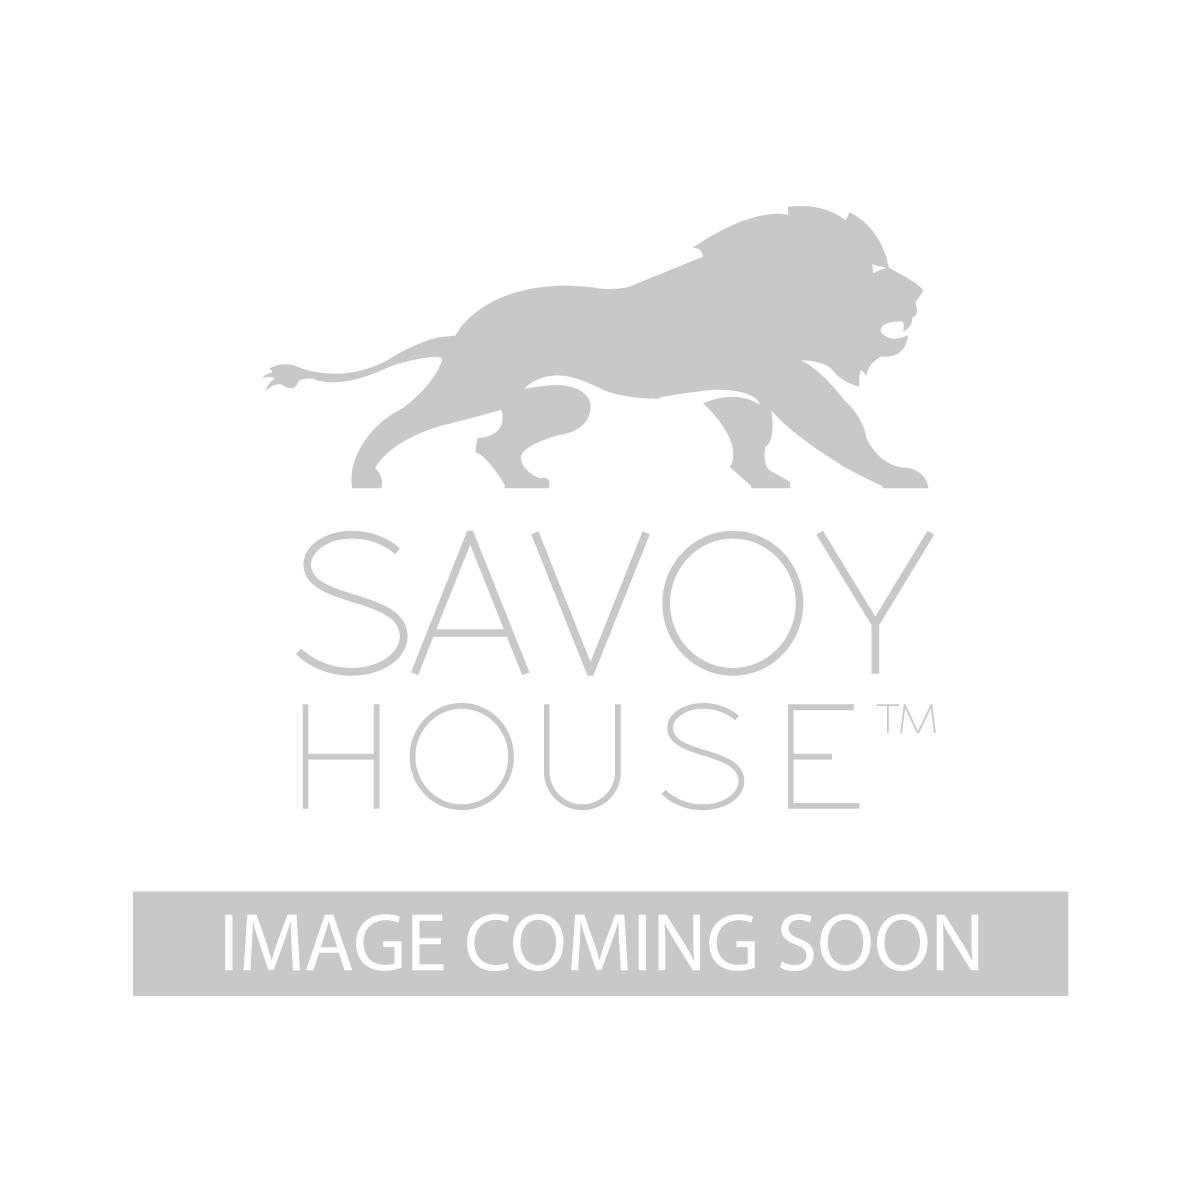 4 light bath bar modern forms grant light bath bar 82102413 by savoy house